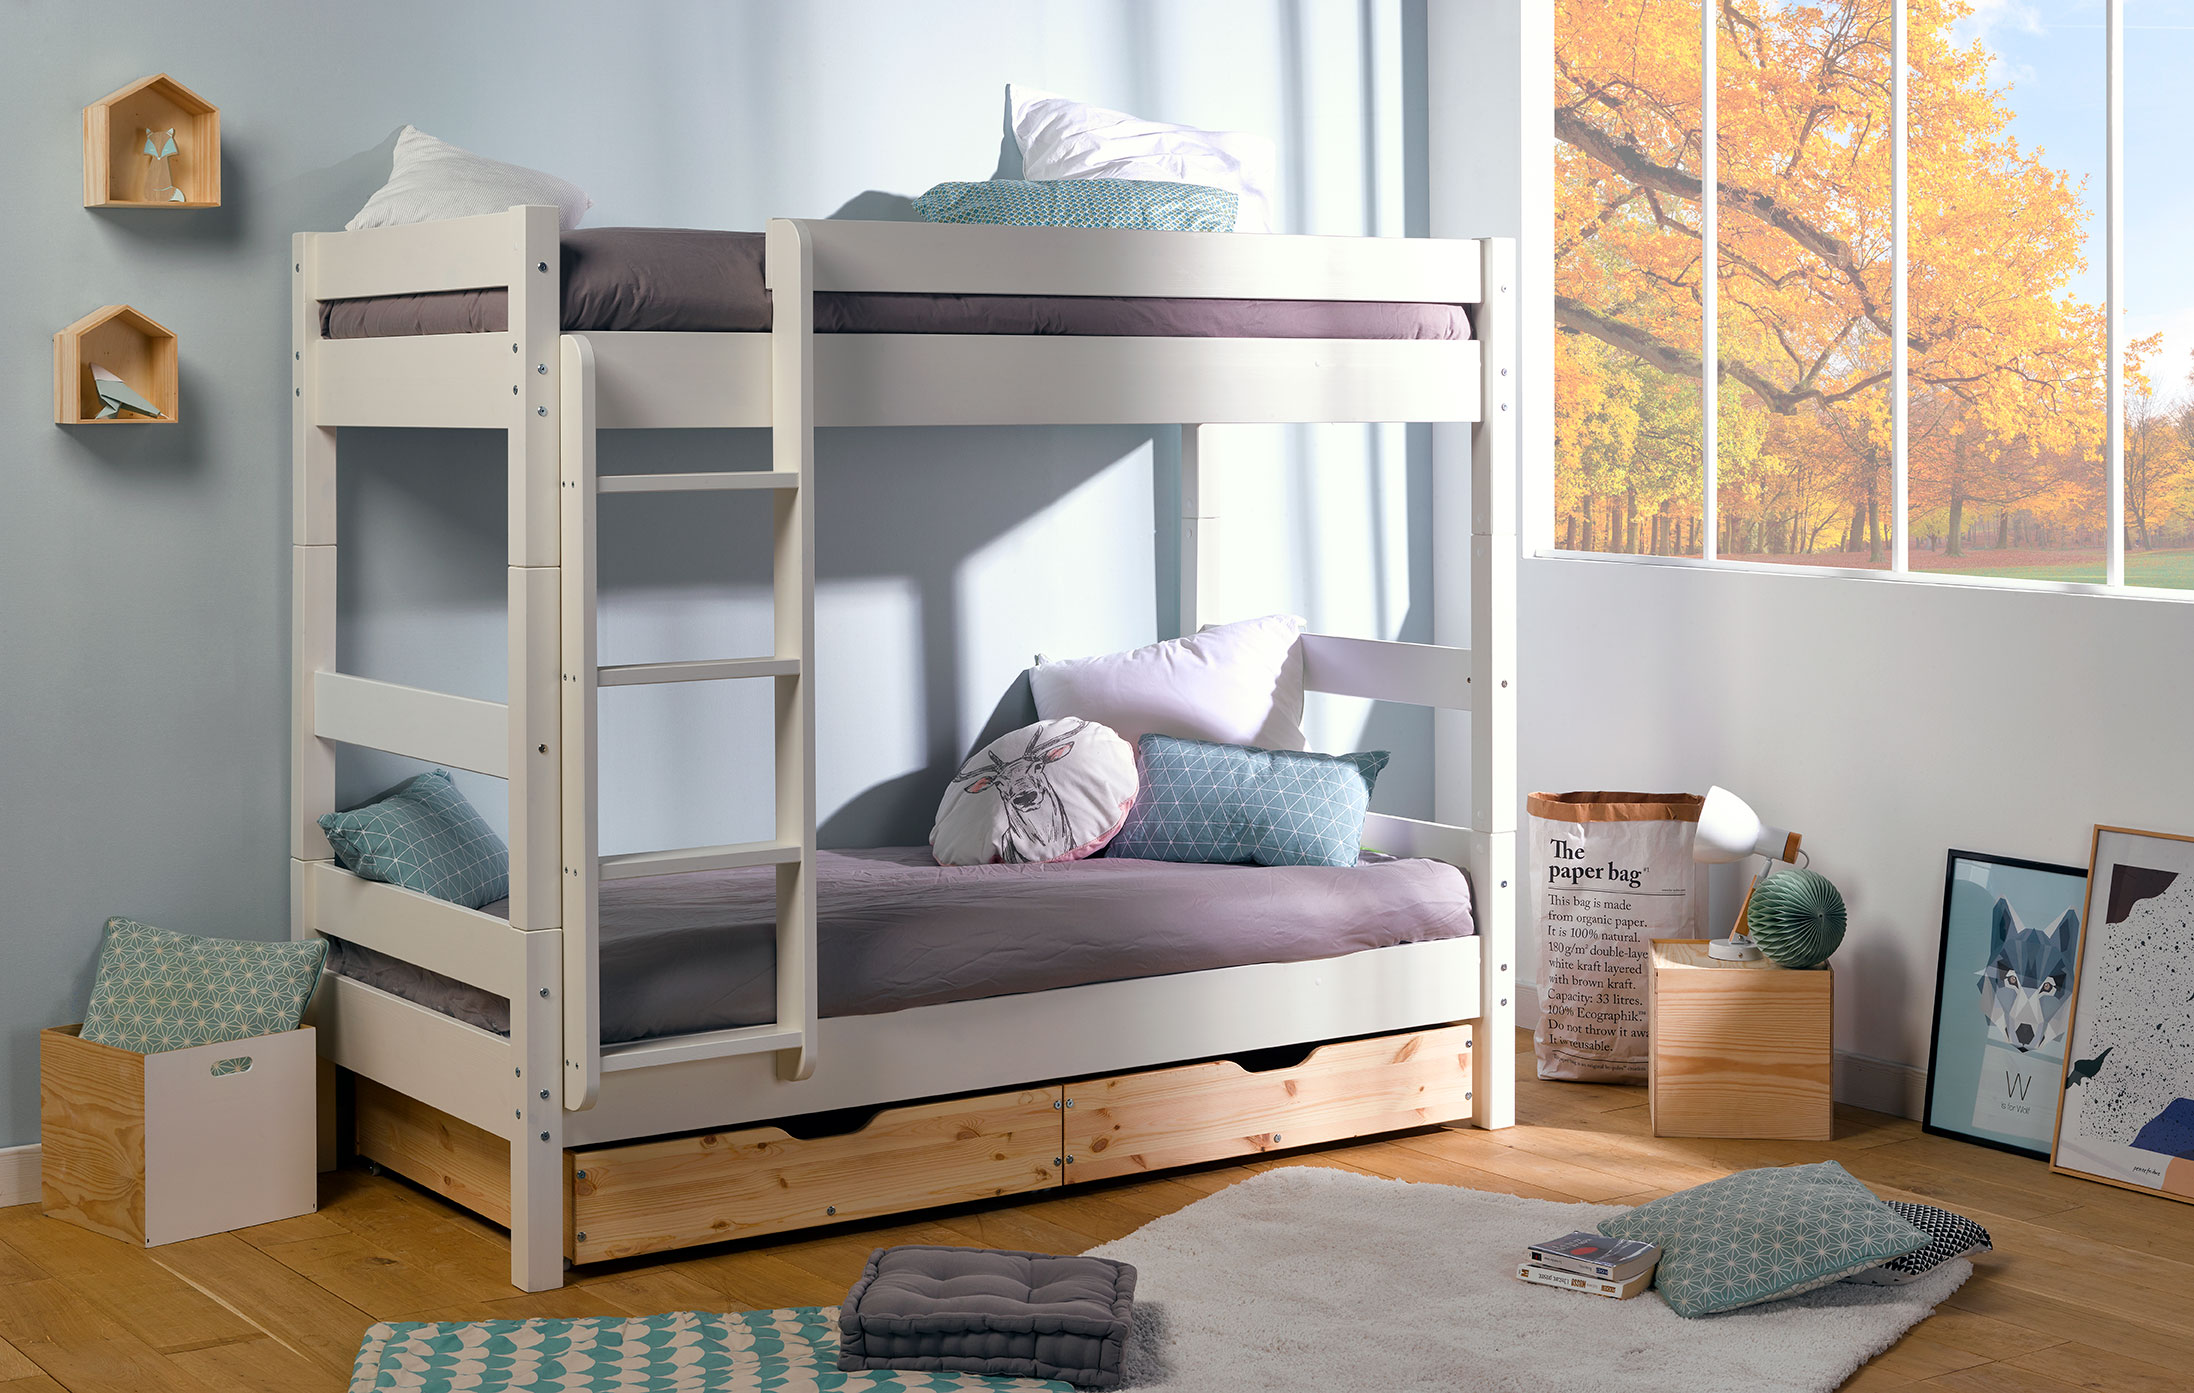 lit superpos enfant volutif bois finition brute idkid 39 s. Black Bedroom Furniture Sets. Home Design Ideas